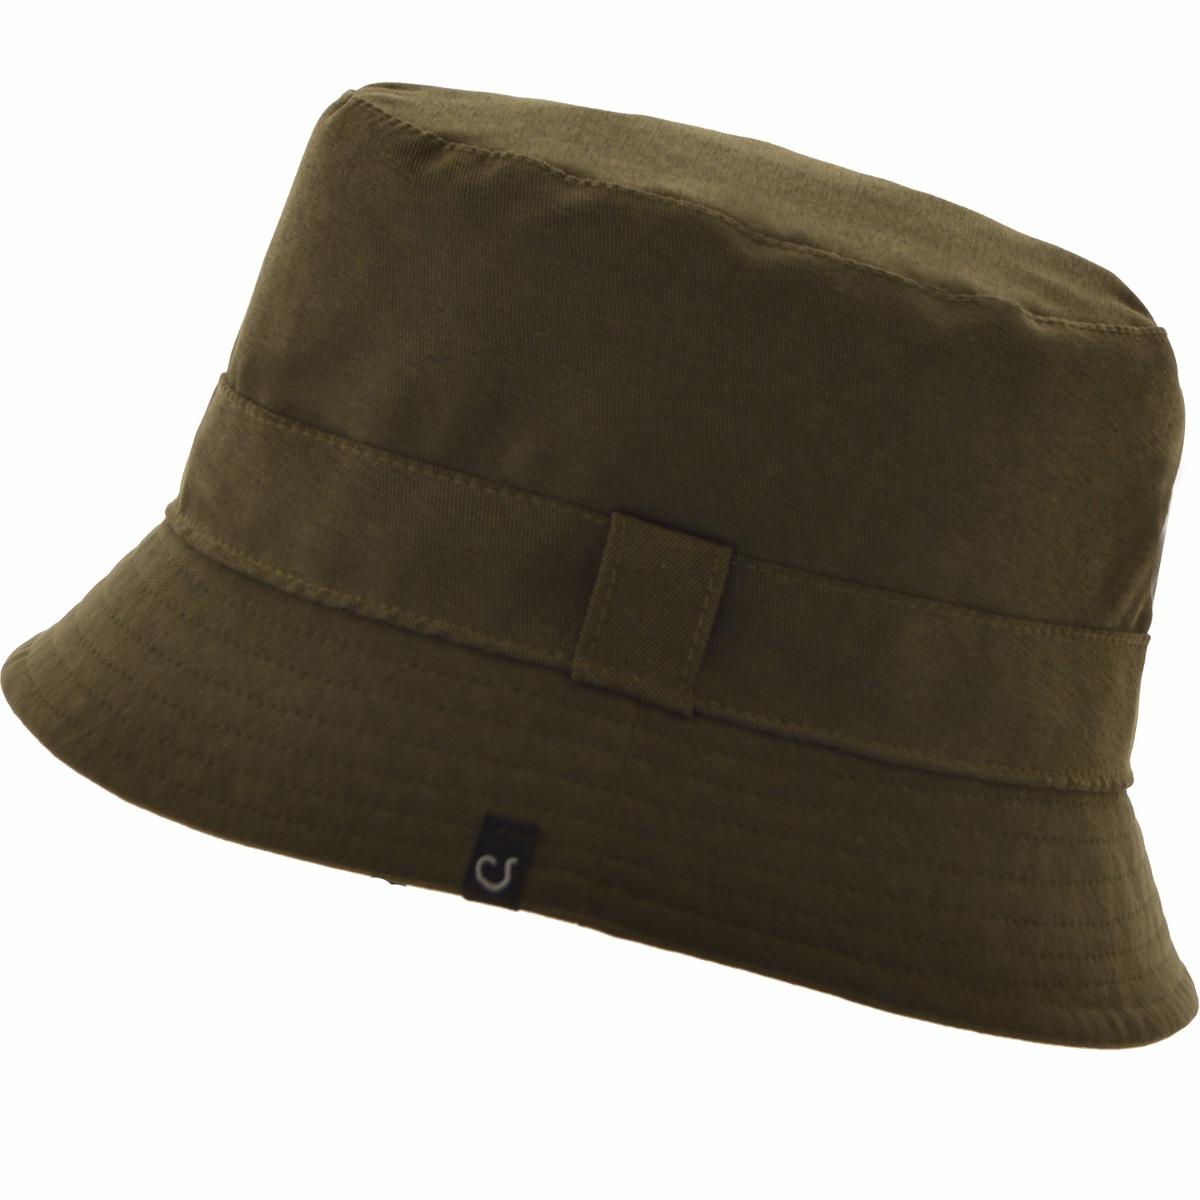 sombrero human sarge lluvia compañia de sombreros m522202-04. Cargando zoom. 7c40f40caa0e